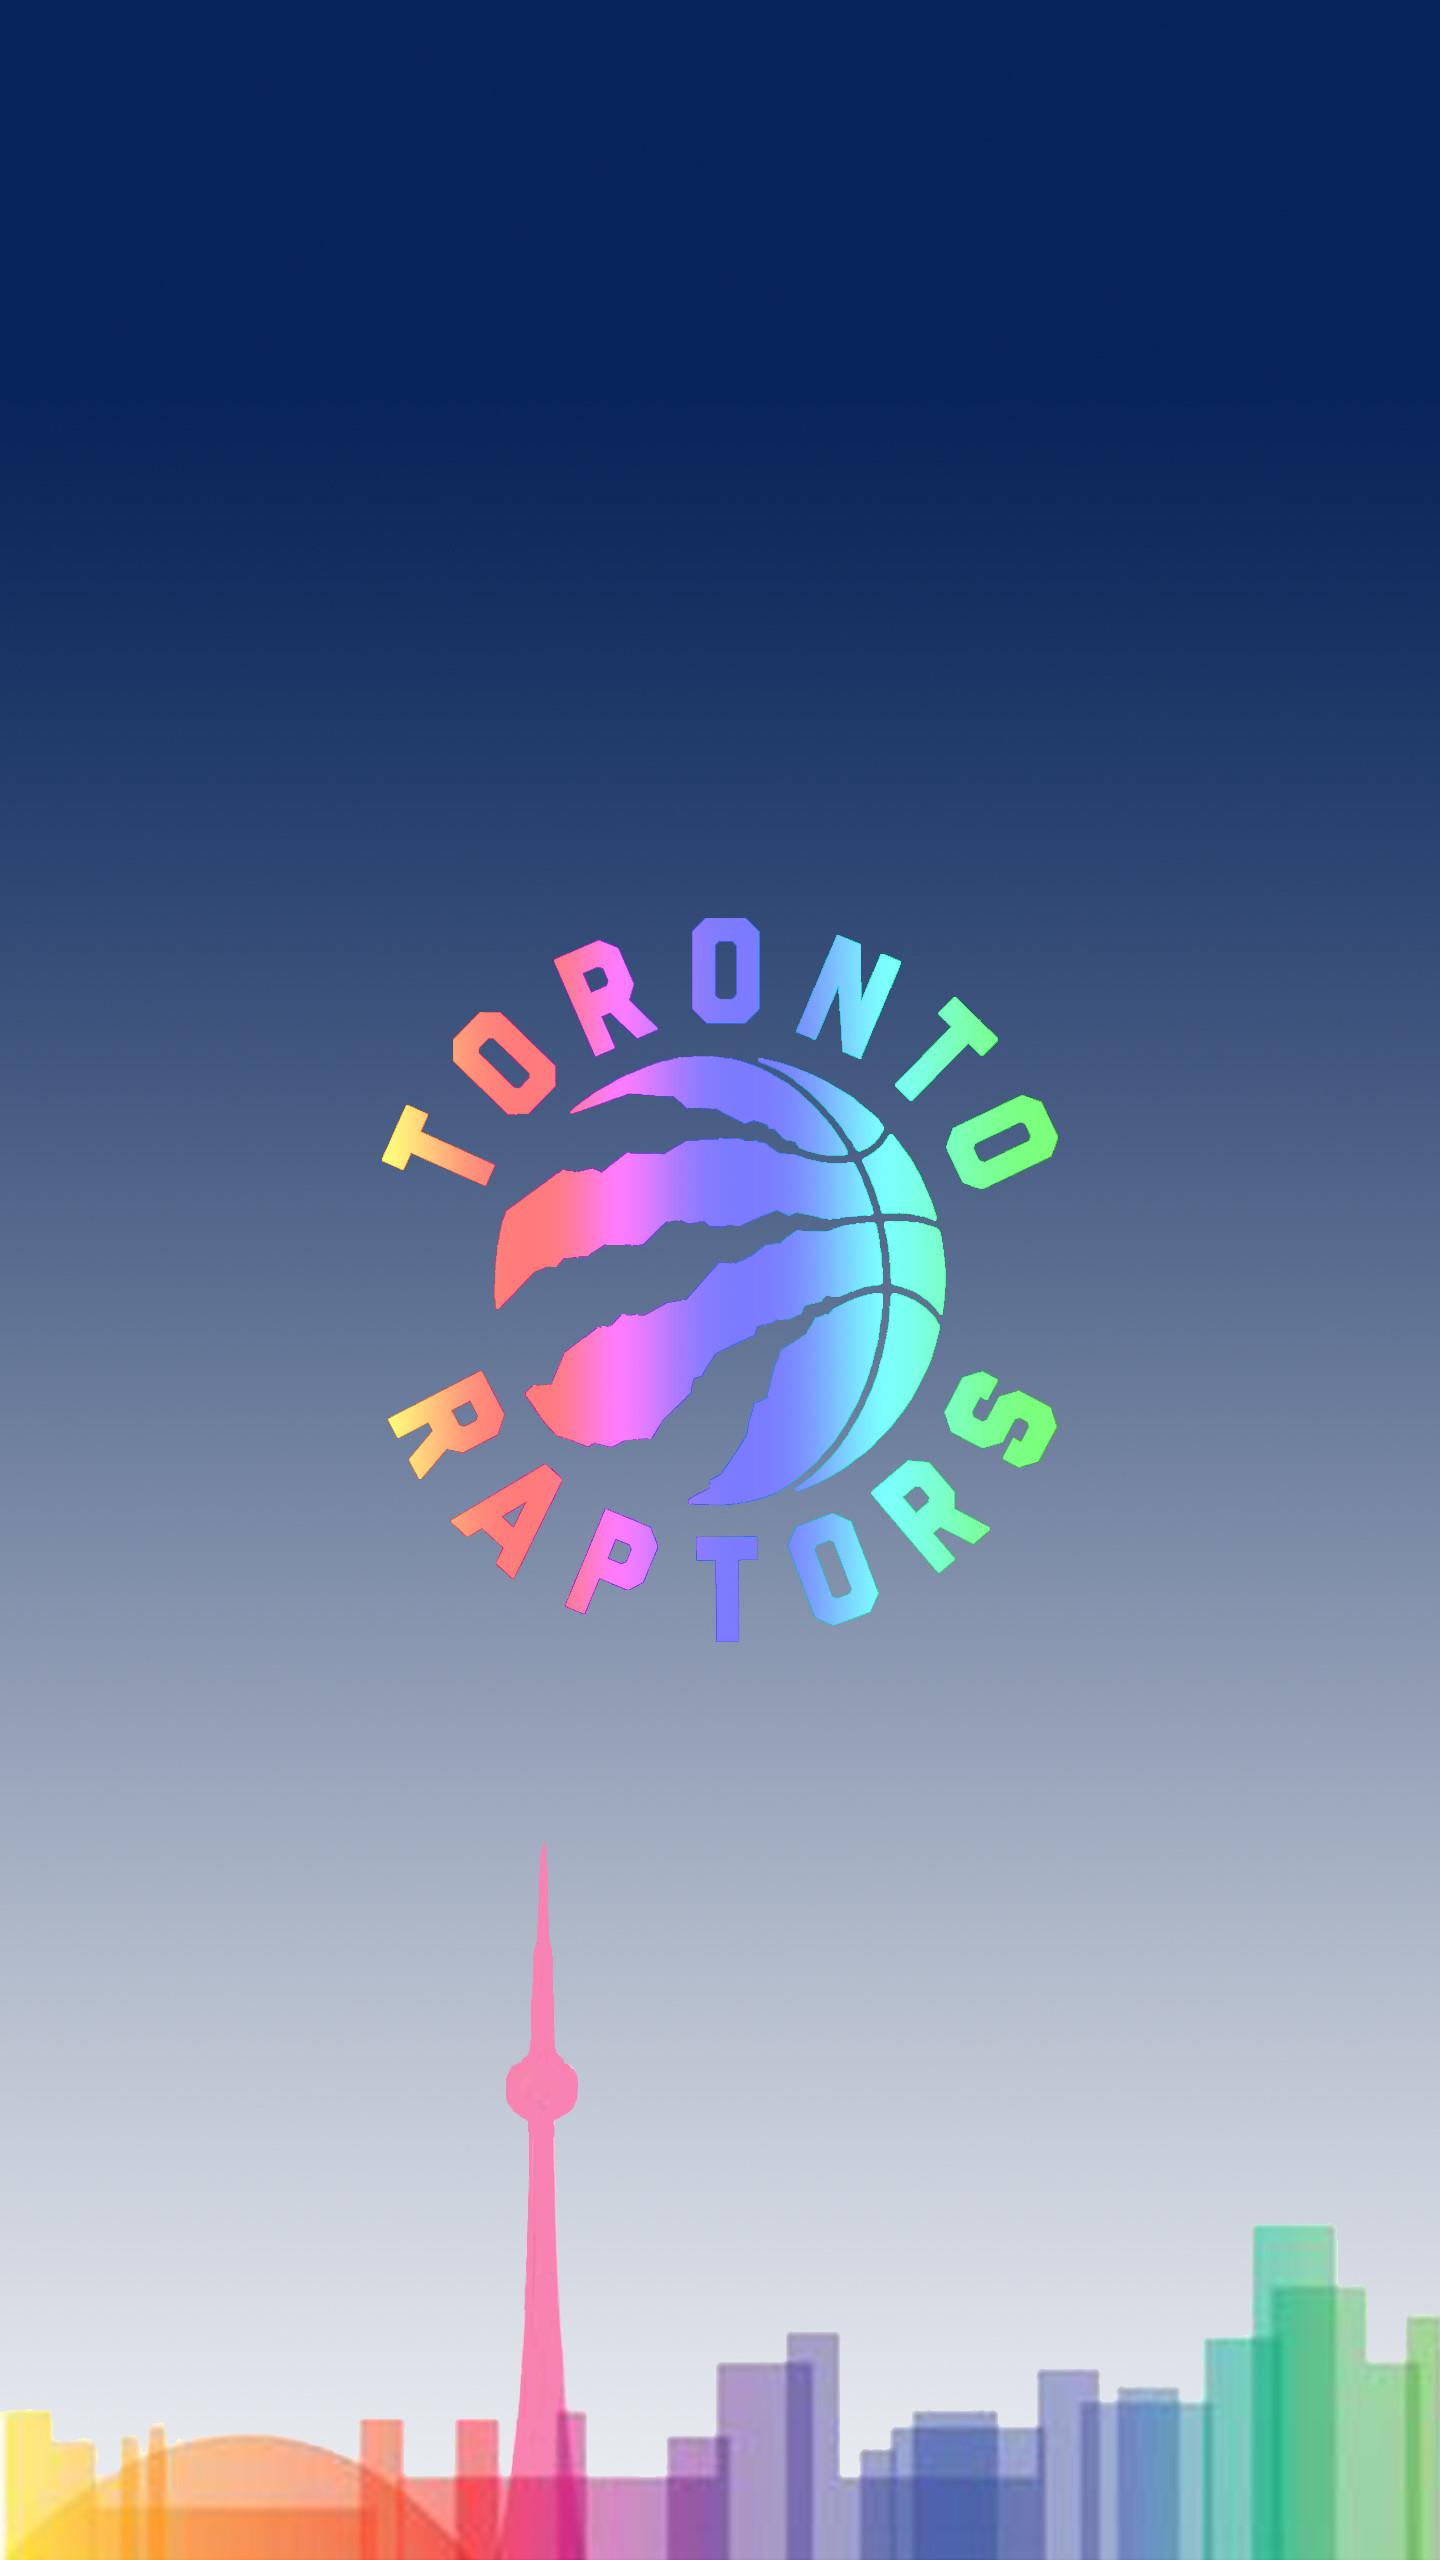 Toronto Raptors Wallpapers 183 ① Wallpapertag